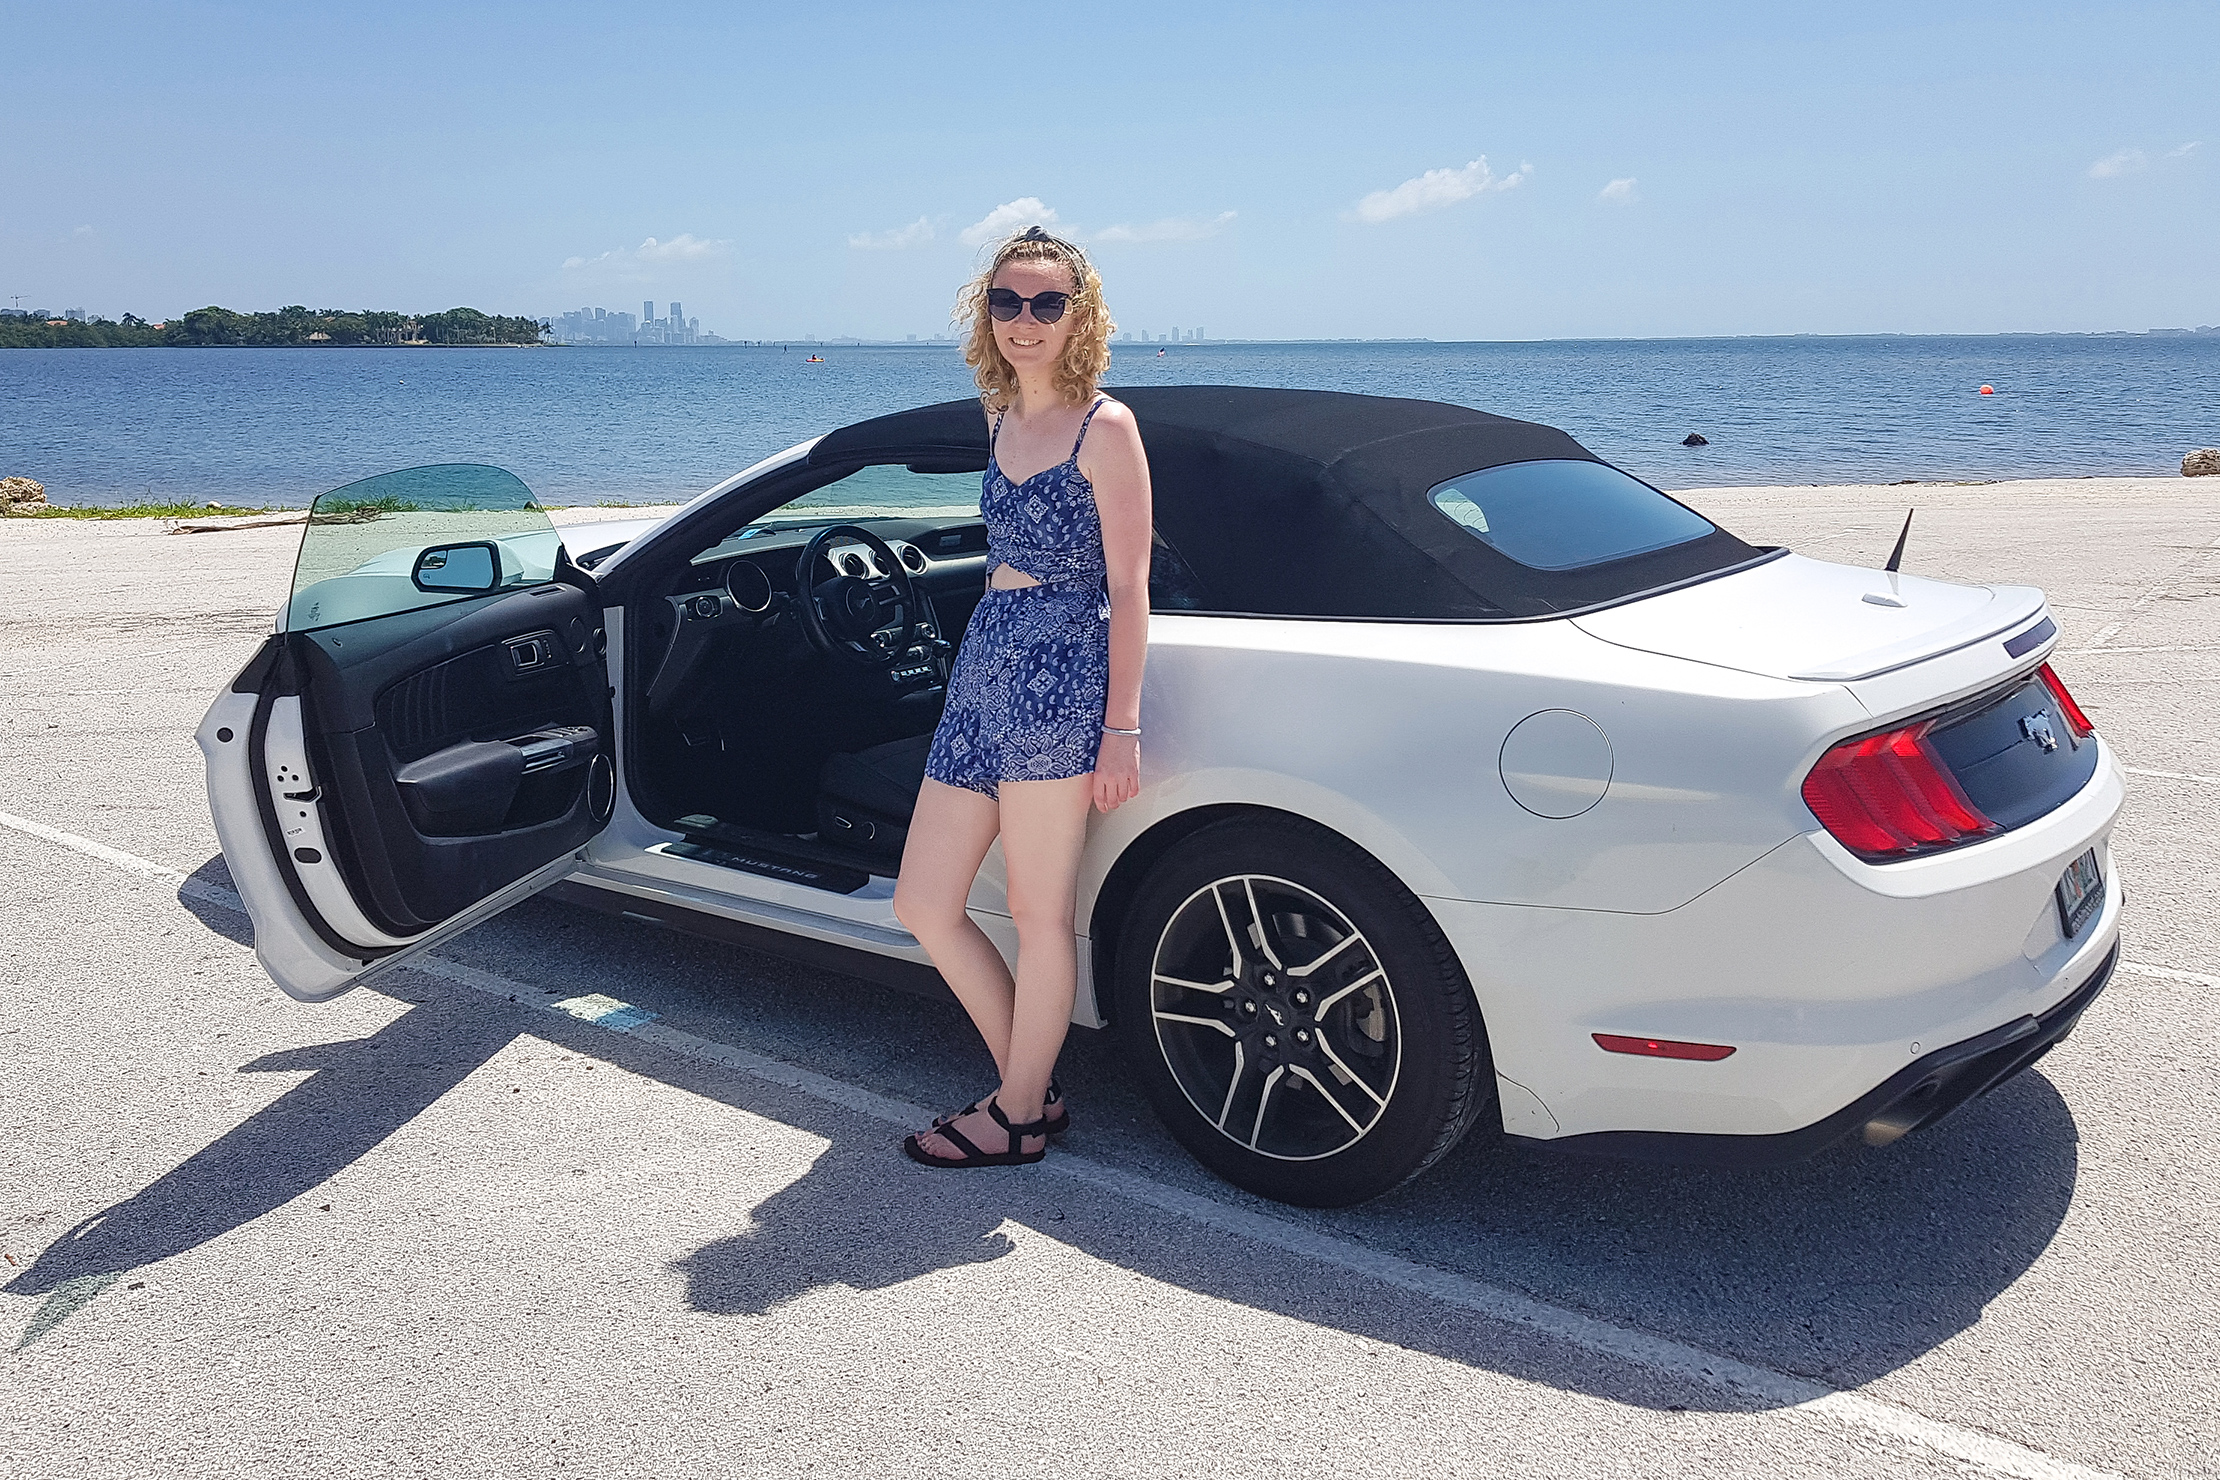 Road Trip Car In Miami Car In Miami Road Trip Guide